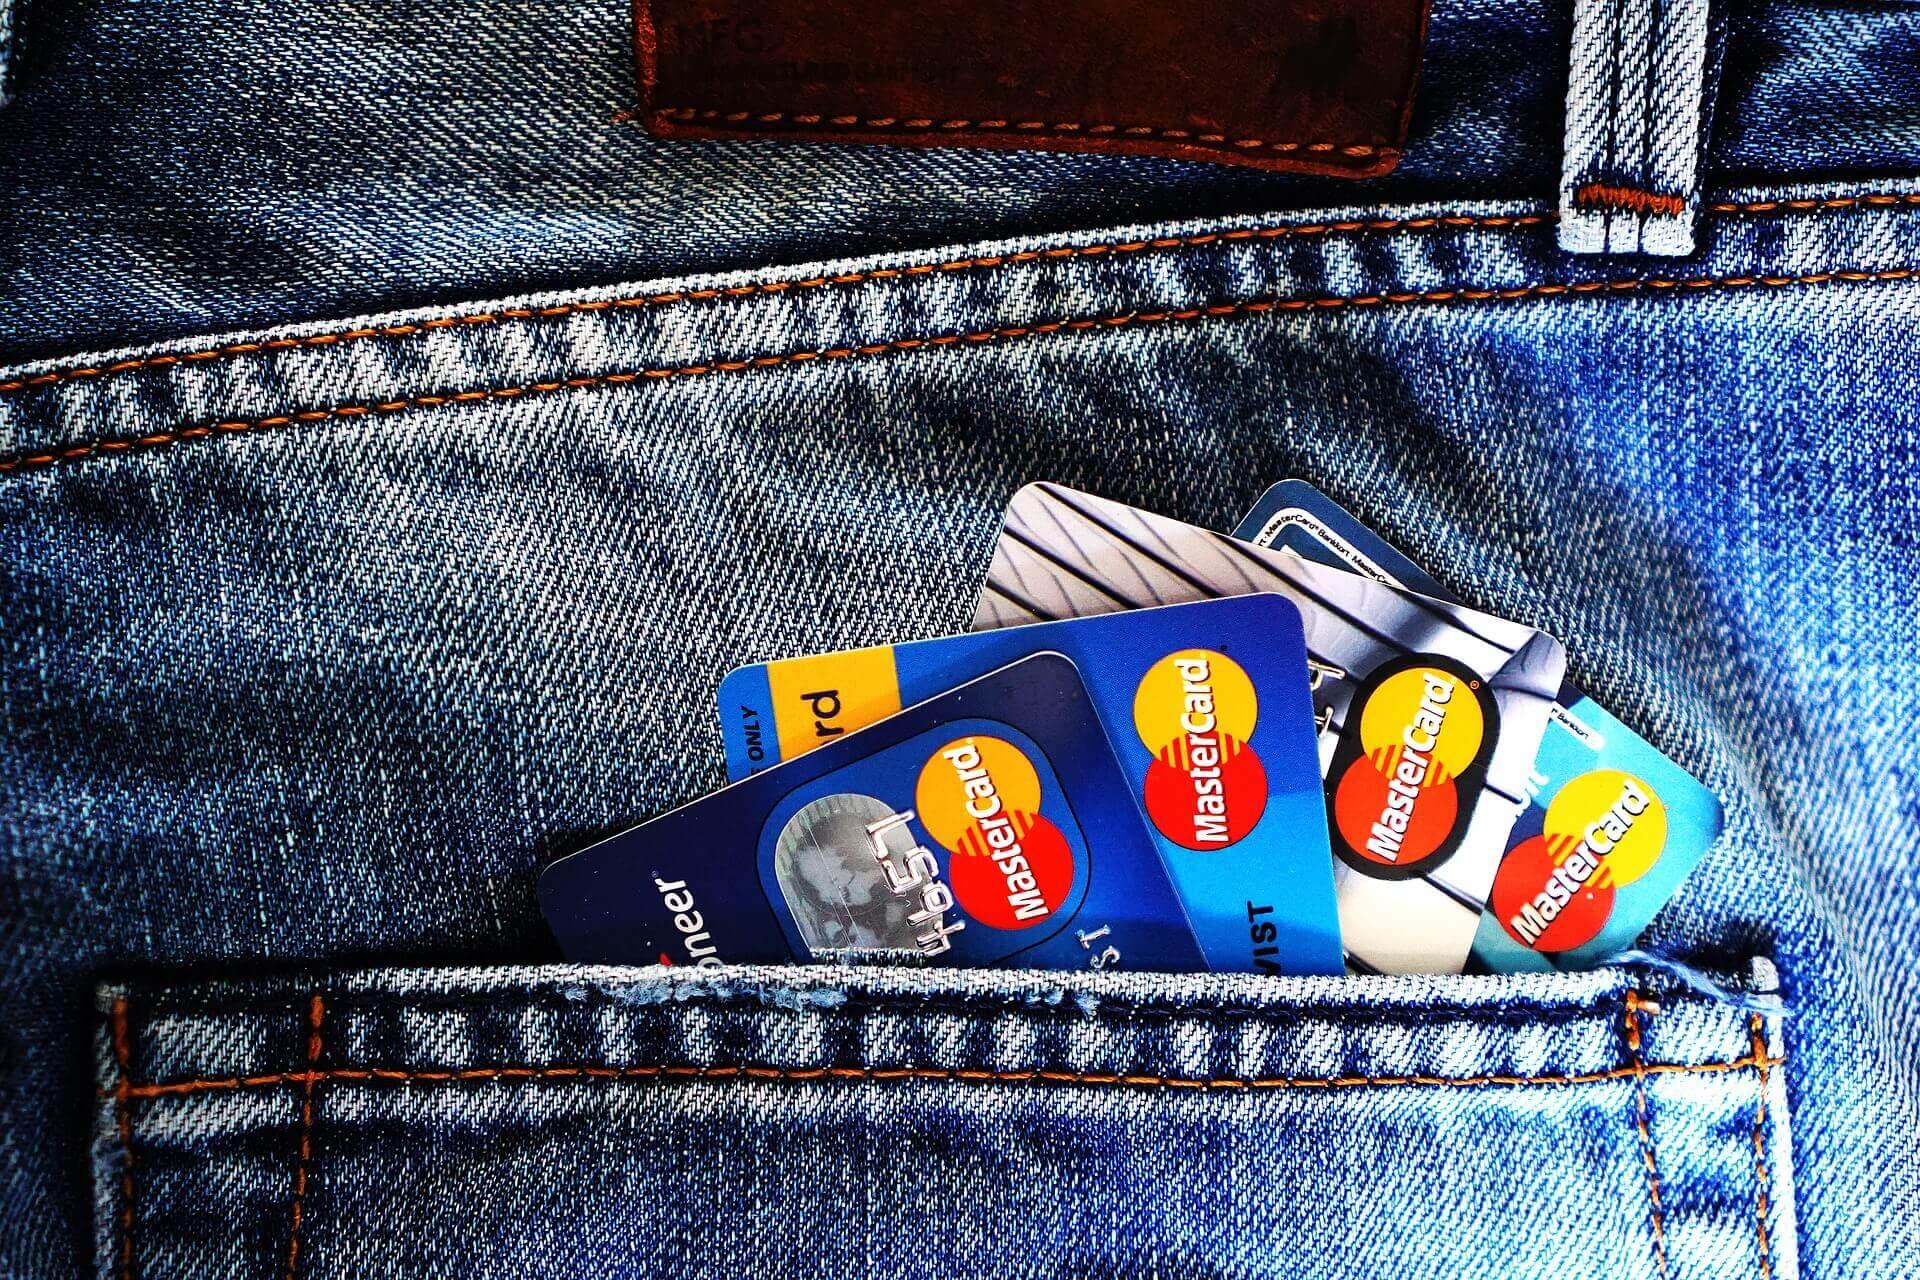 Apple Kreditkarte – kommt da etwas?